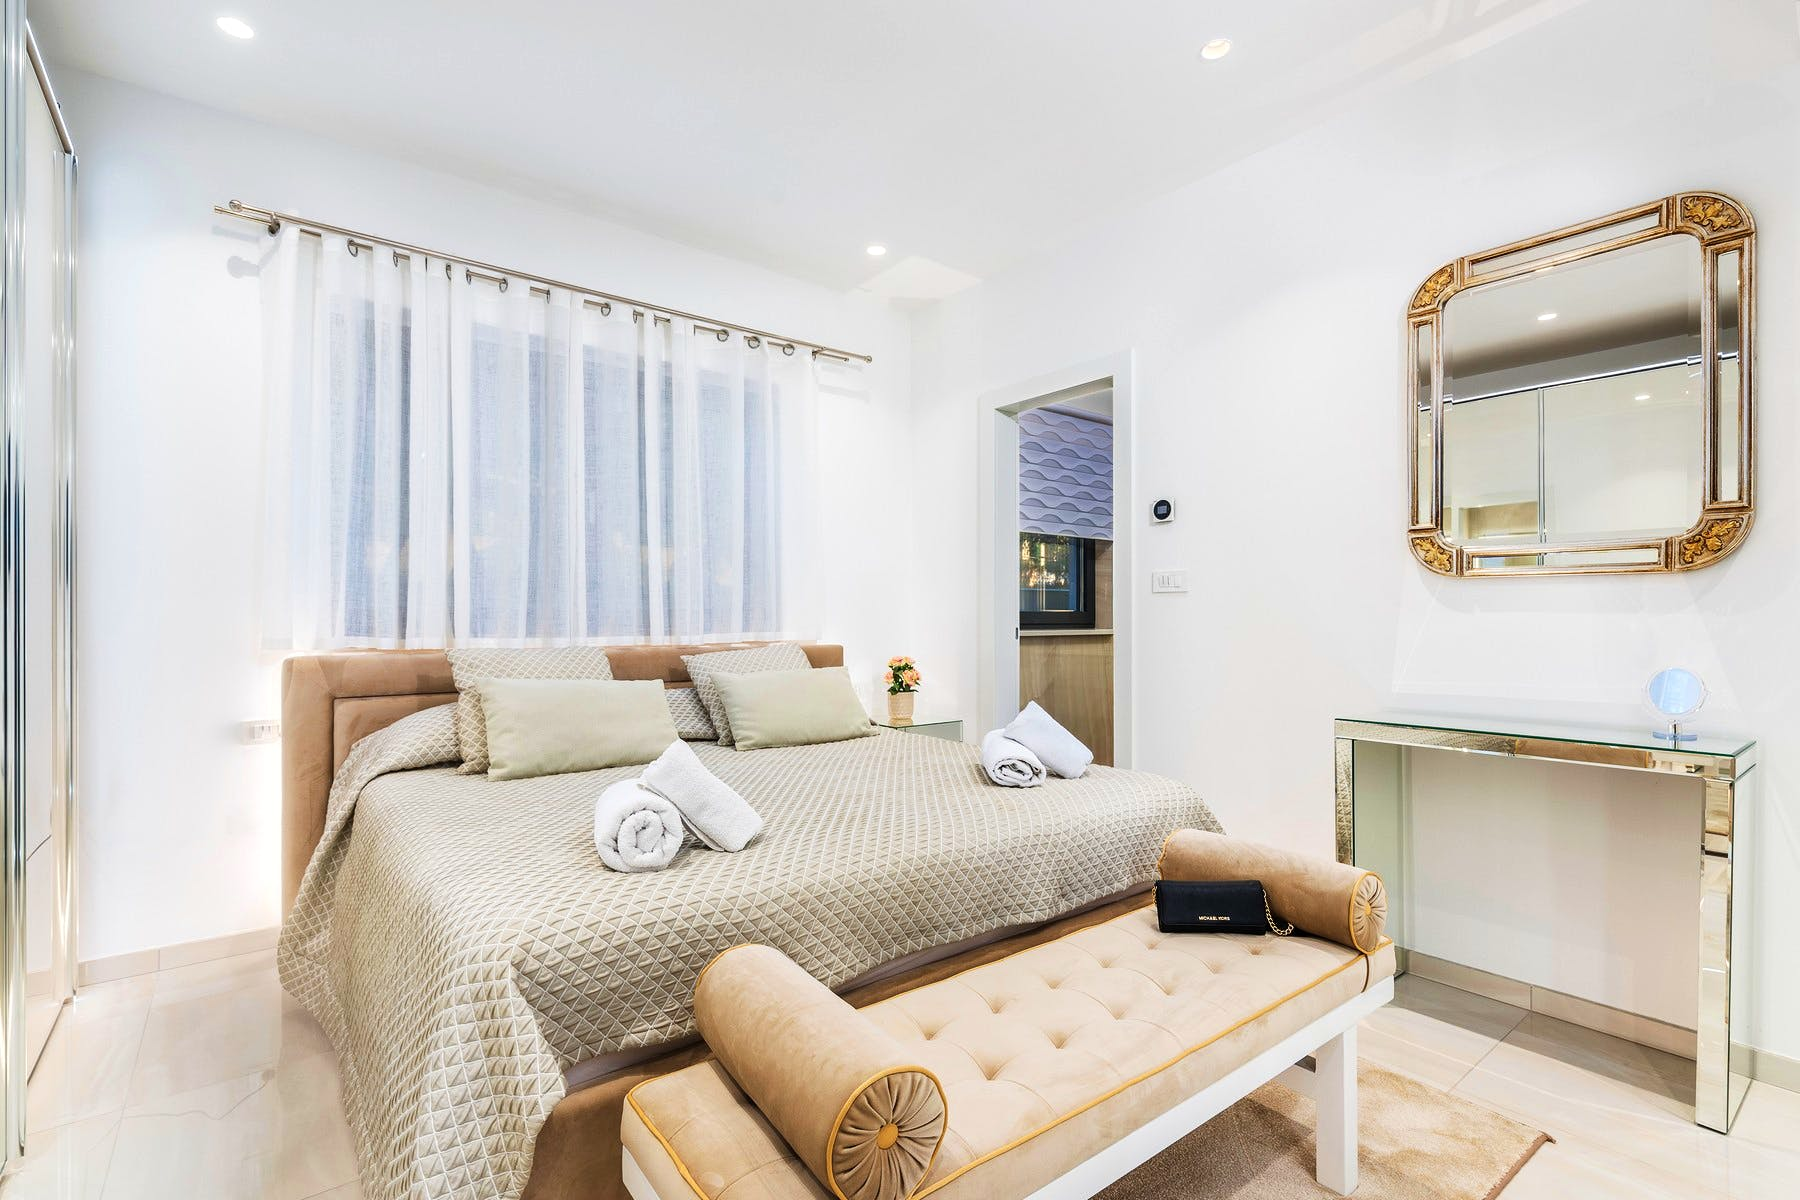 Warm and cozy bedroom area